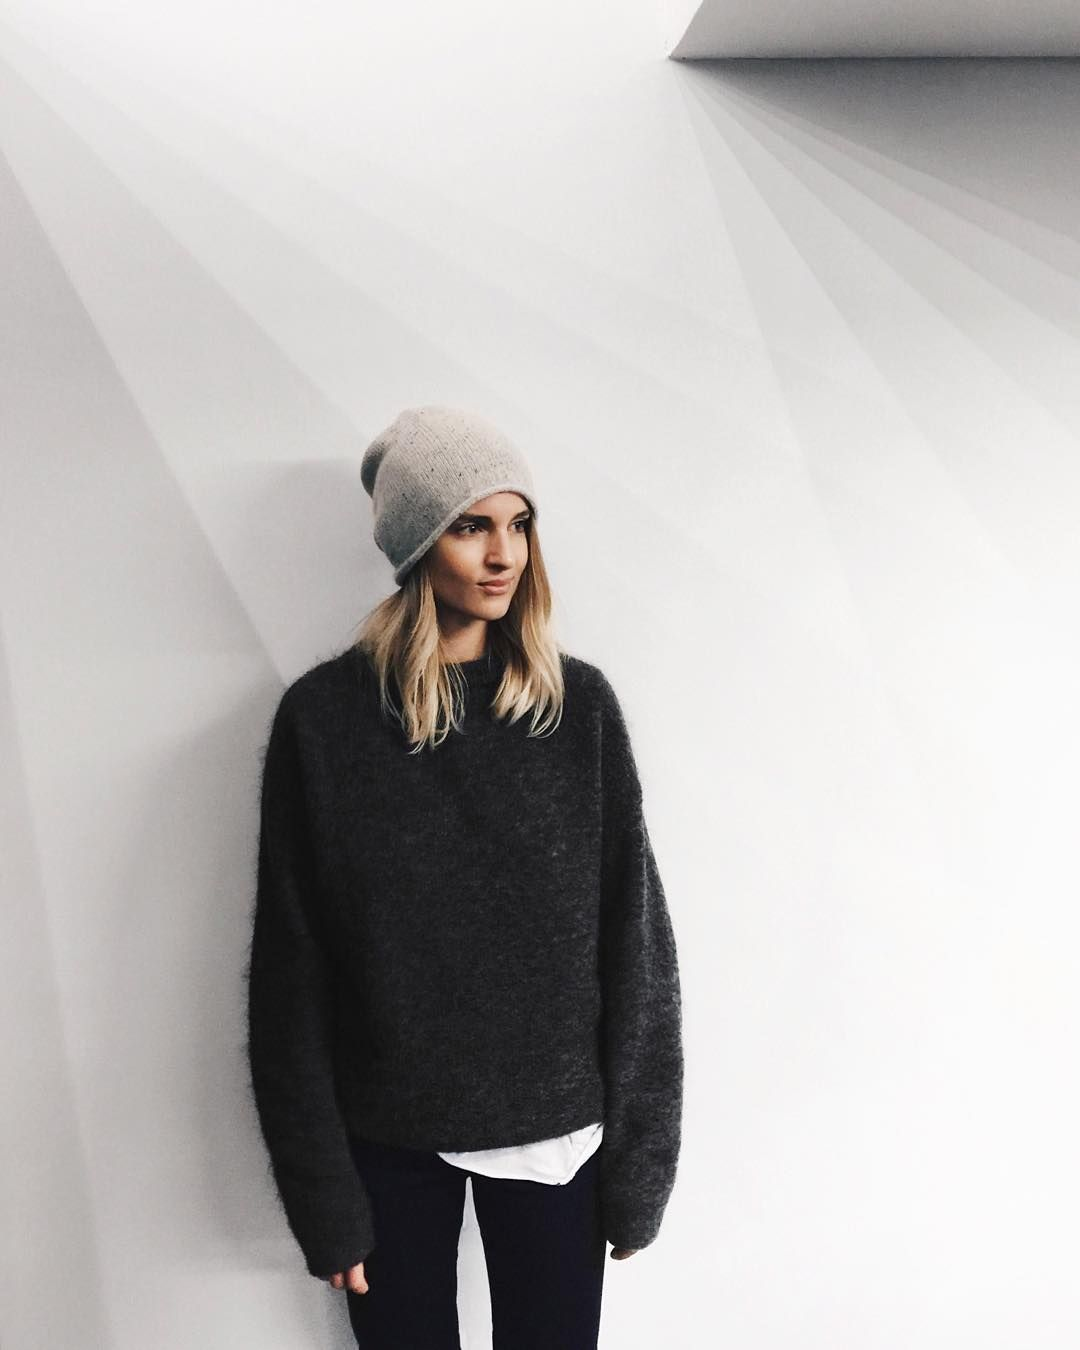 Inspiration Inspirationfashion the neighbourhoods sweater weather